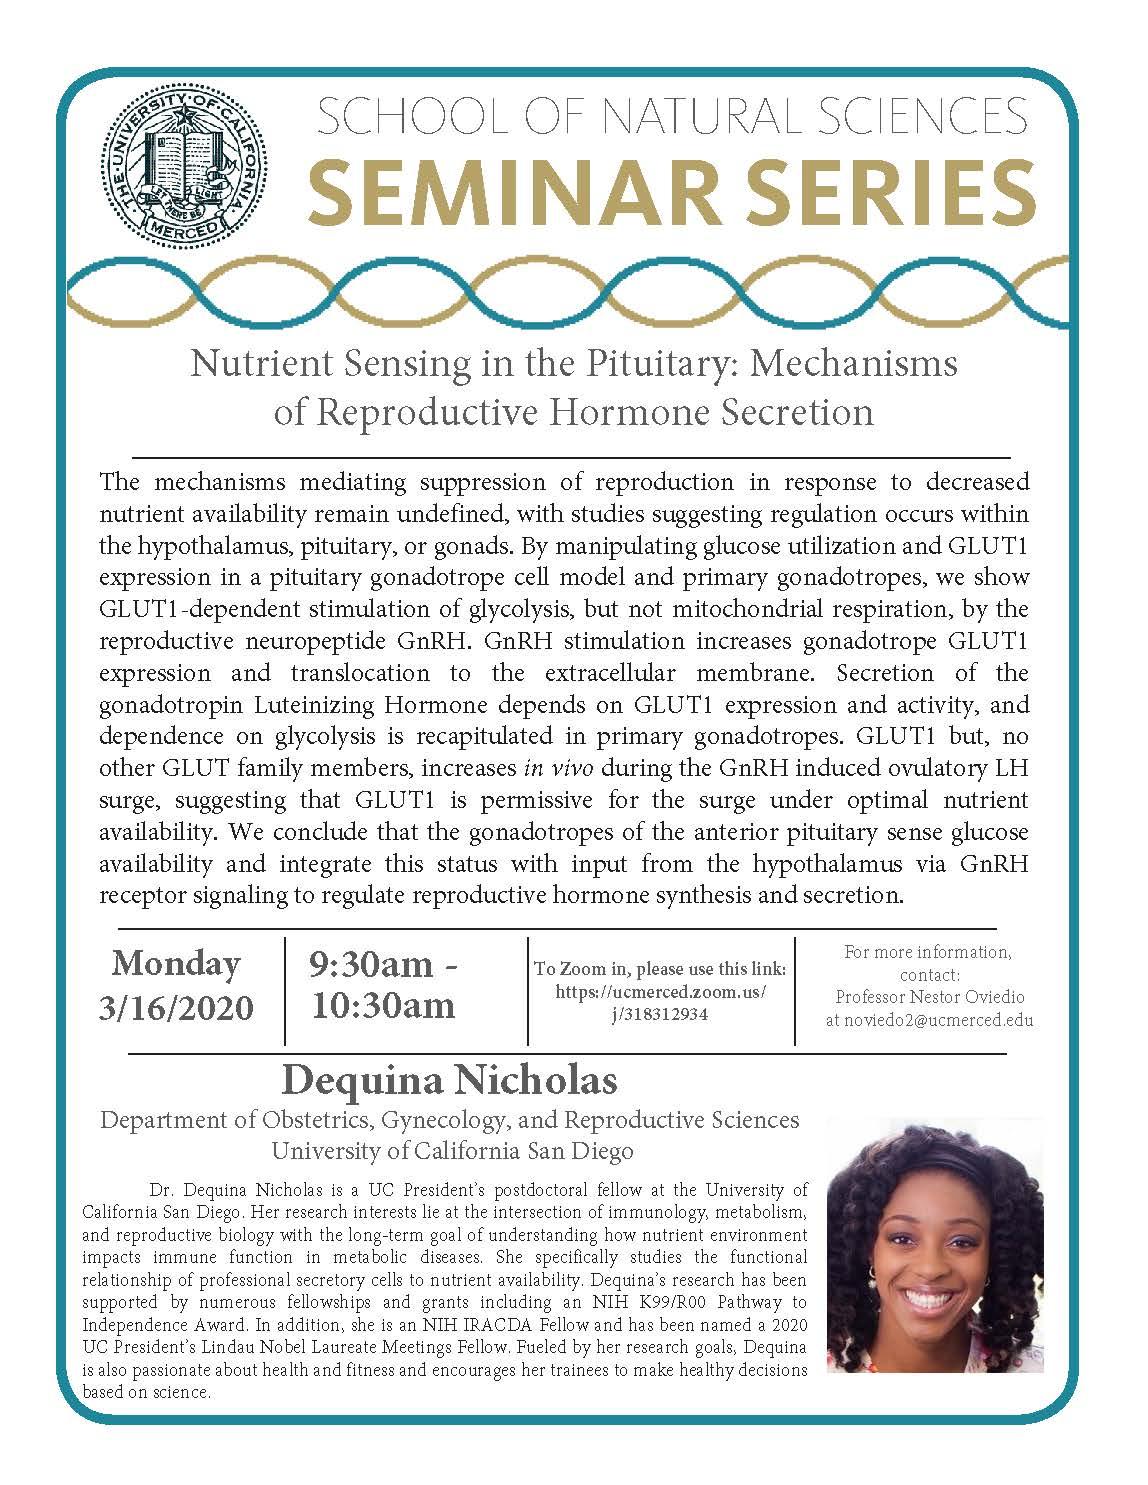 MCB Physiology Seminar for Dequina Nicholas